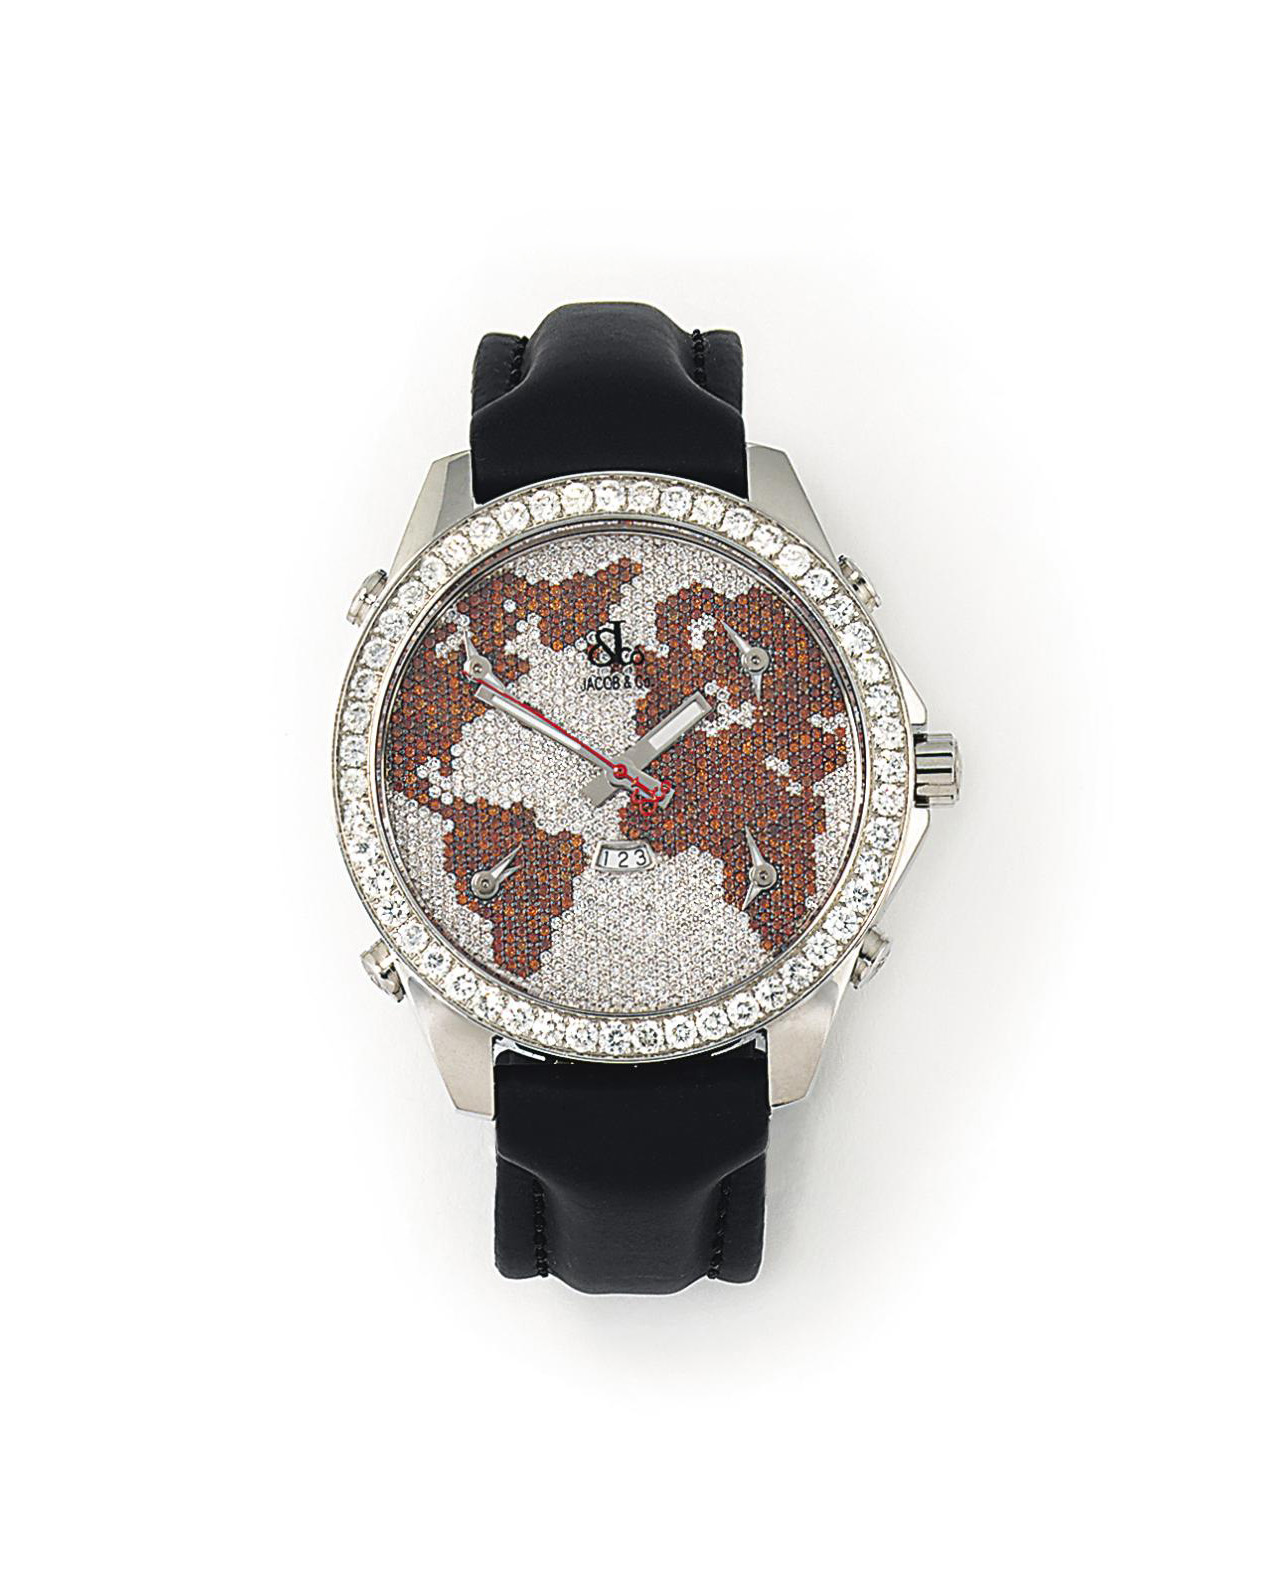 A DIAMOND AND TREATED DIAMOND-SET STAINLESS STEEL FIVE TIME ZONE QUARTZ WRISTWATCH, BY JACOB & CO.